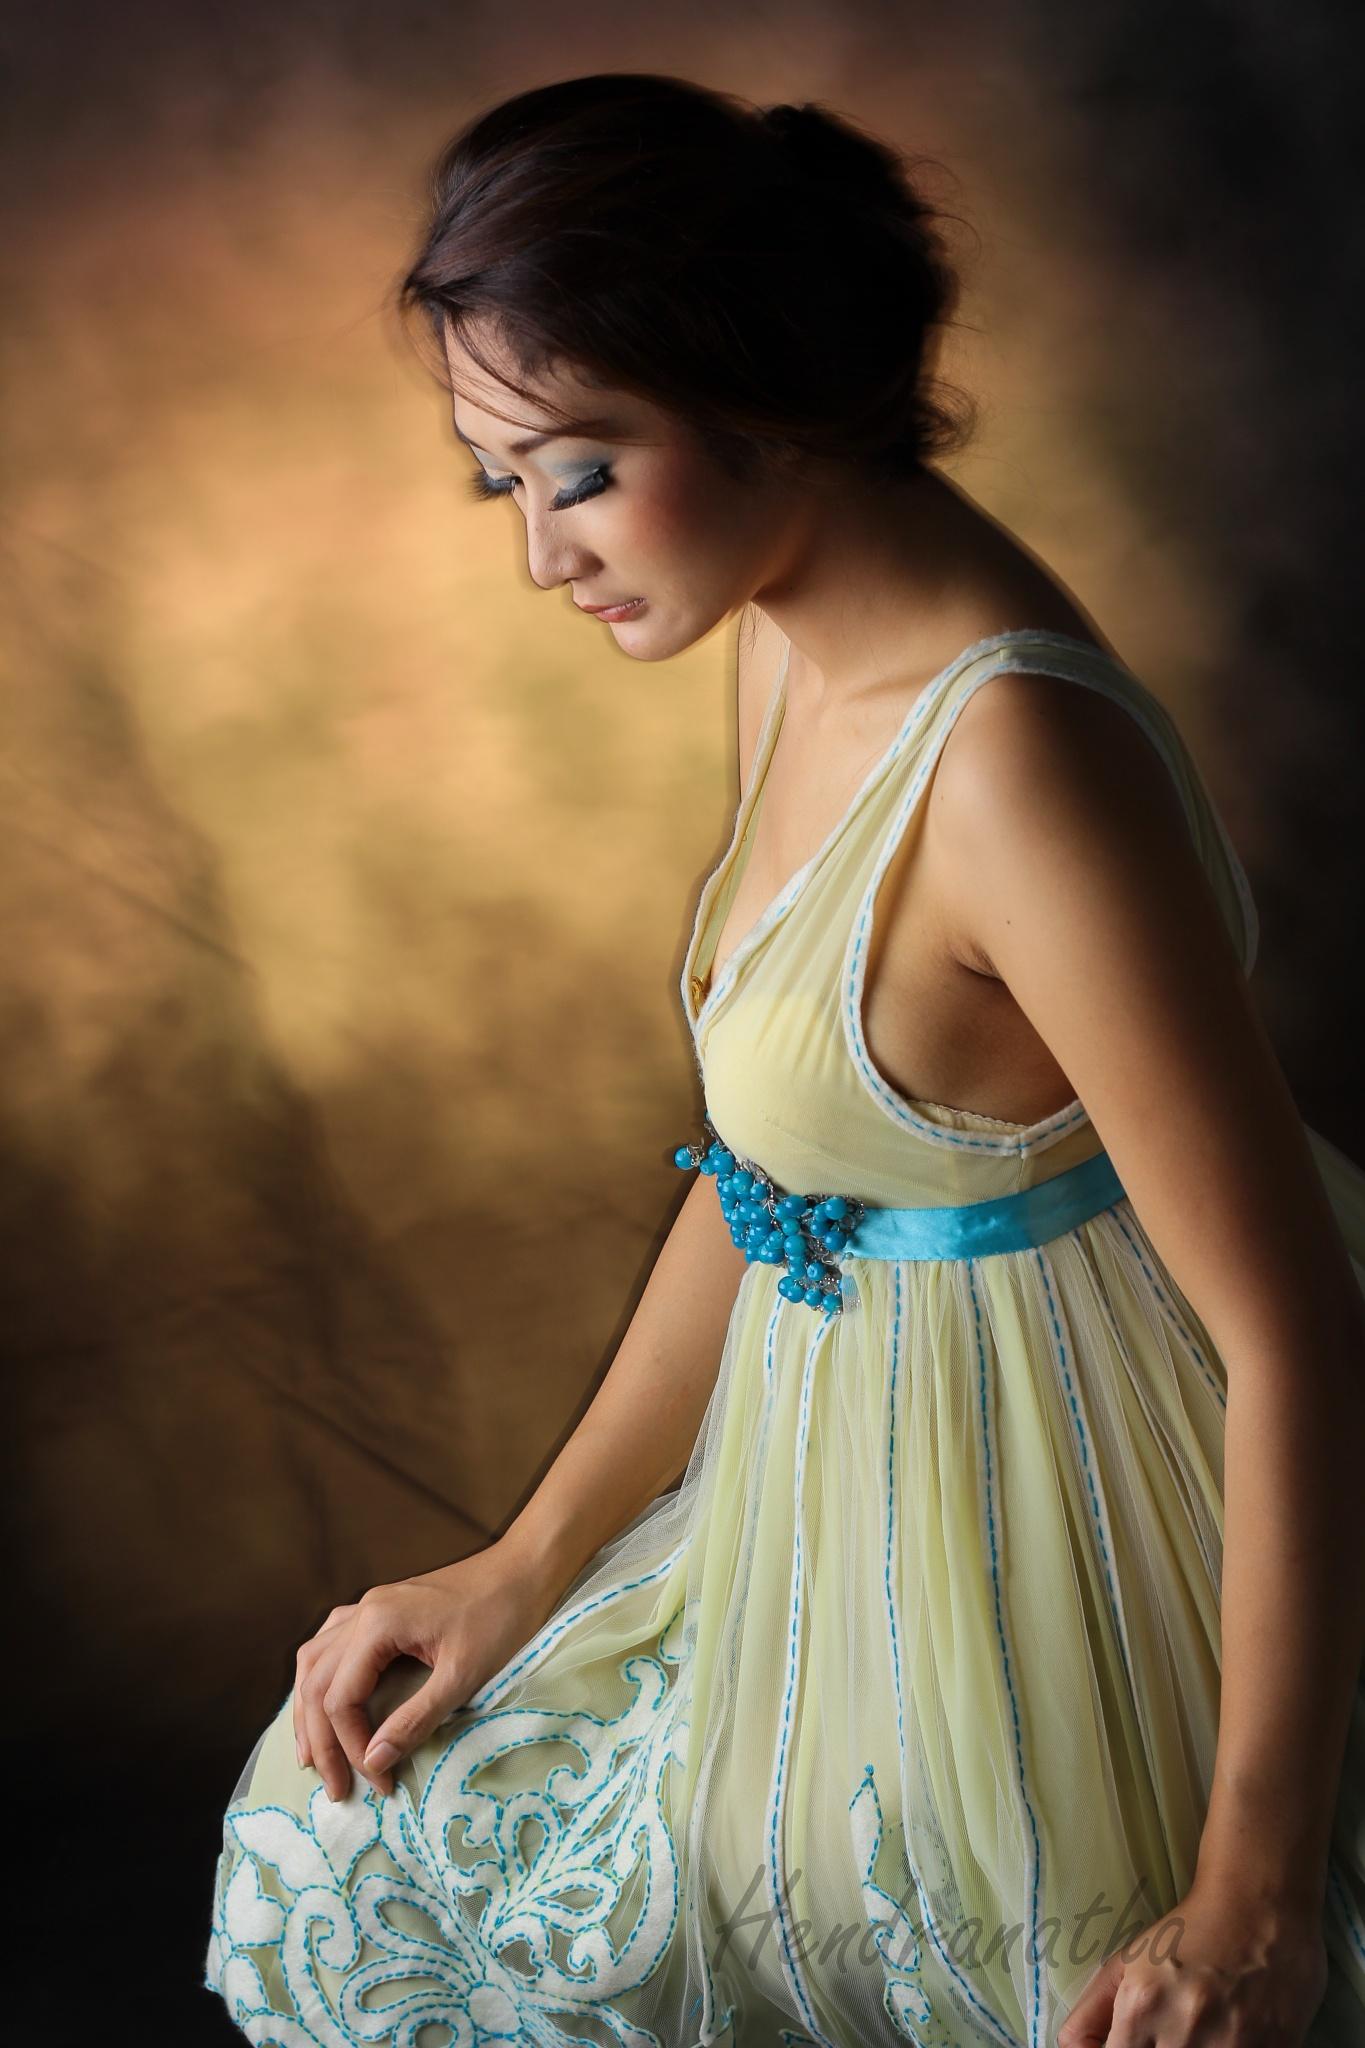 Just pose  by Hendranatha